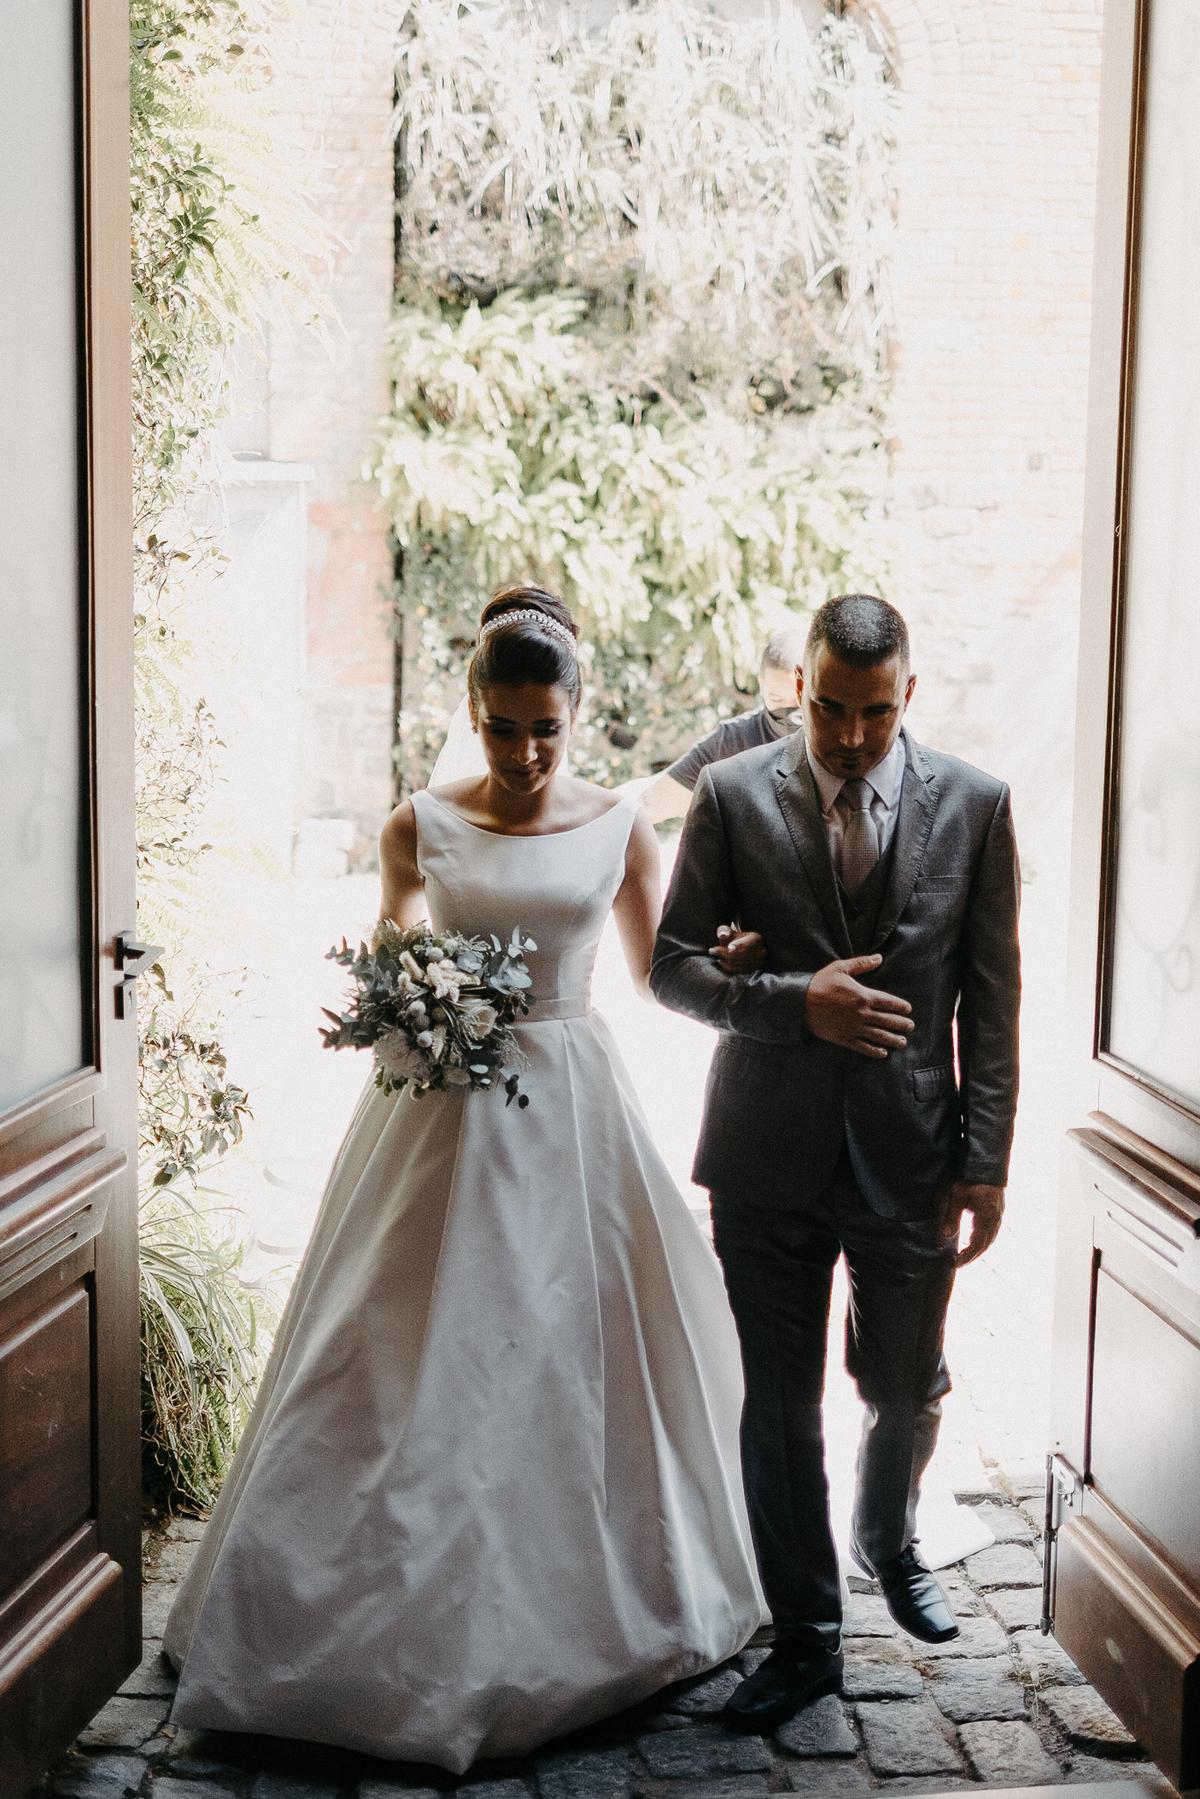 entrada da noiva casamentos de dia casar no campo ao ar livre fotografos de casamento fotos por caio henrique vestido de noiva vestido minimalista